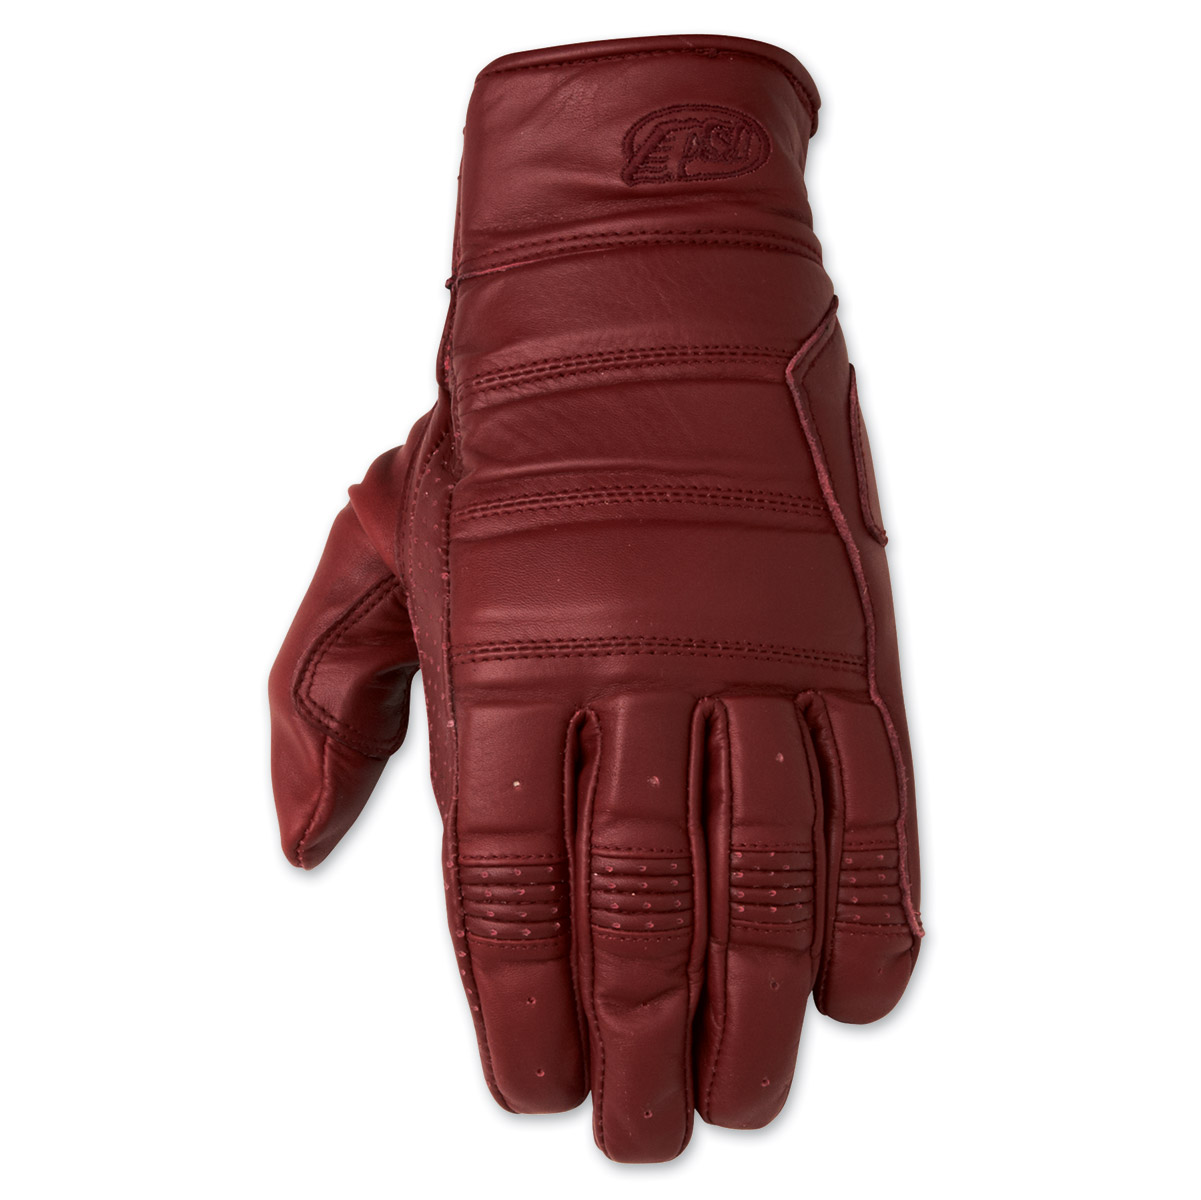 Motorcycle gloves with id pocket - Mens Oxblood Gloves Roland Sands Design Ronin Men S Oxblood Red Leather Gloves